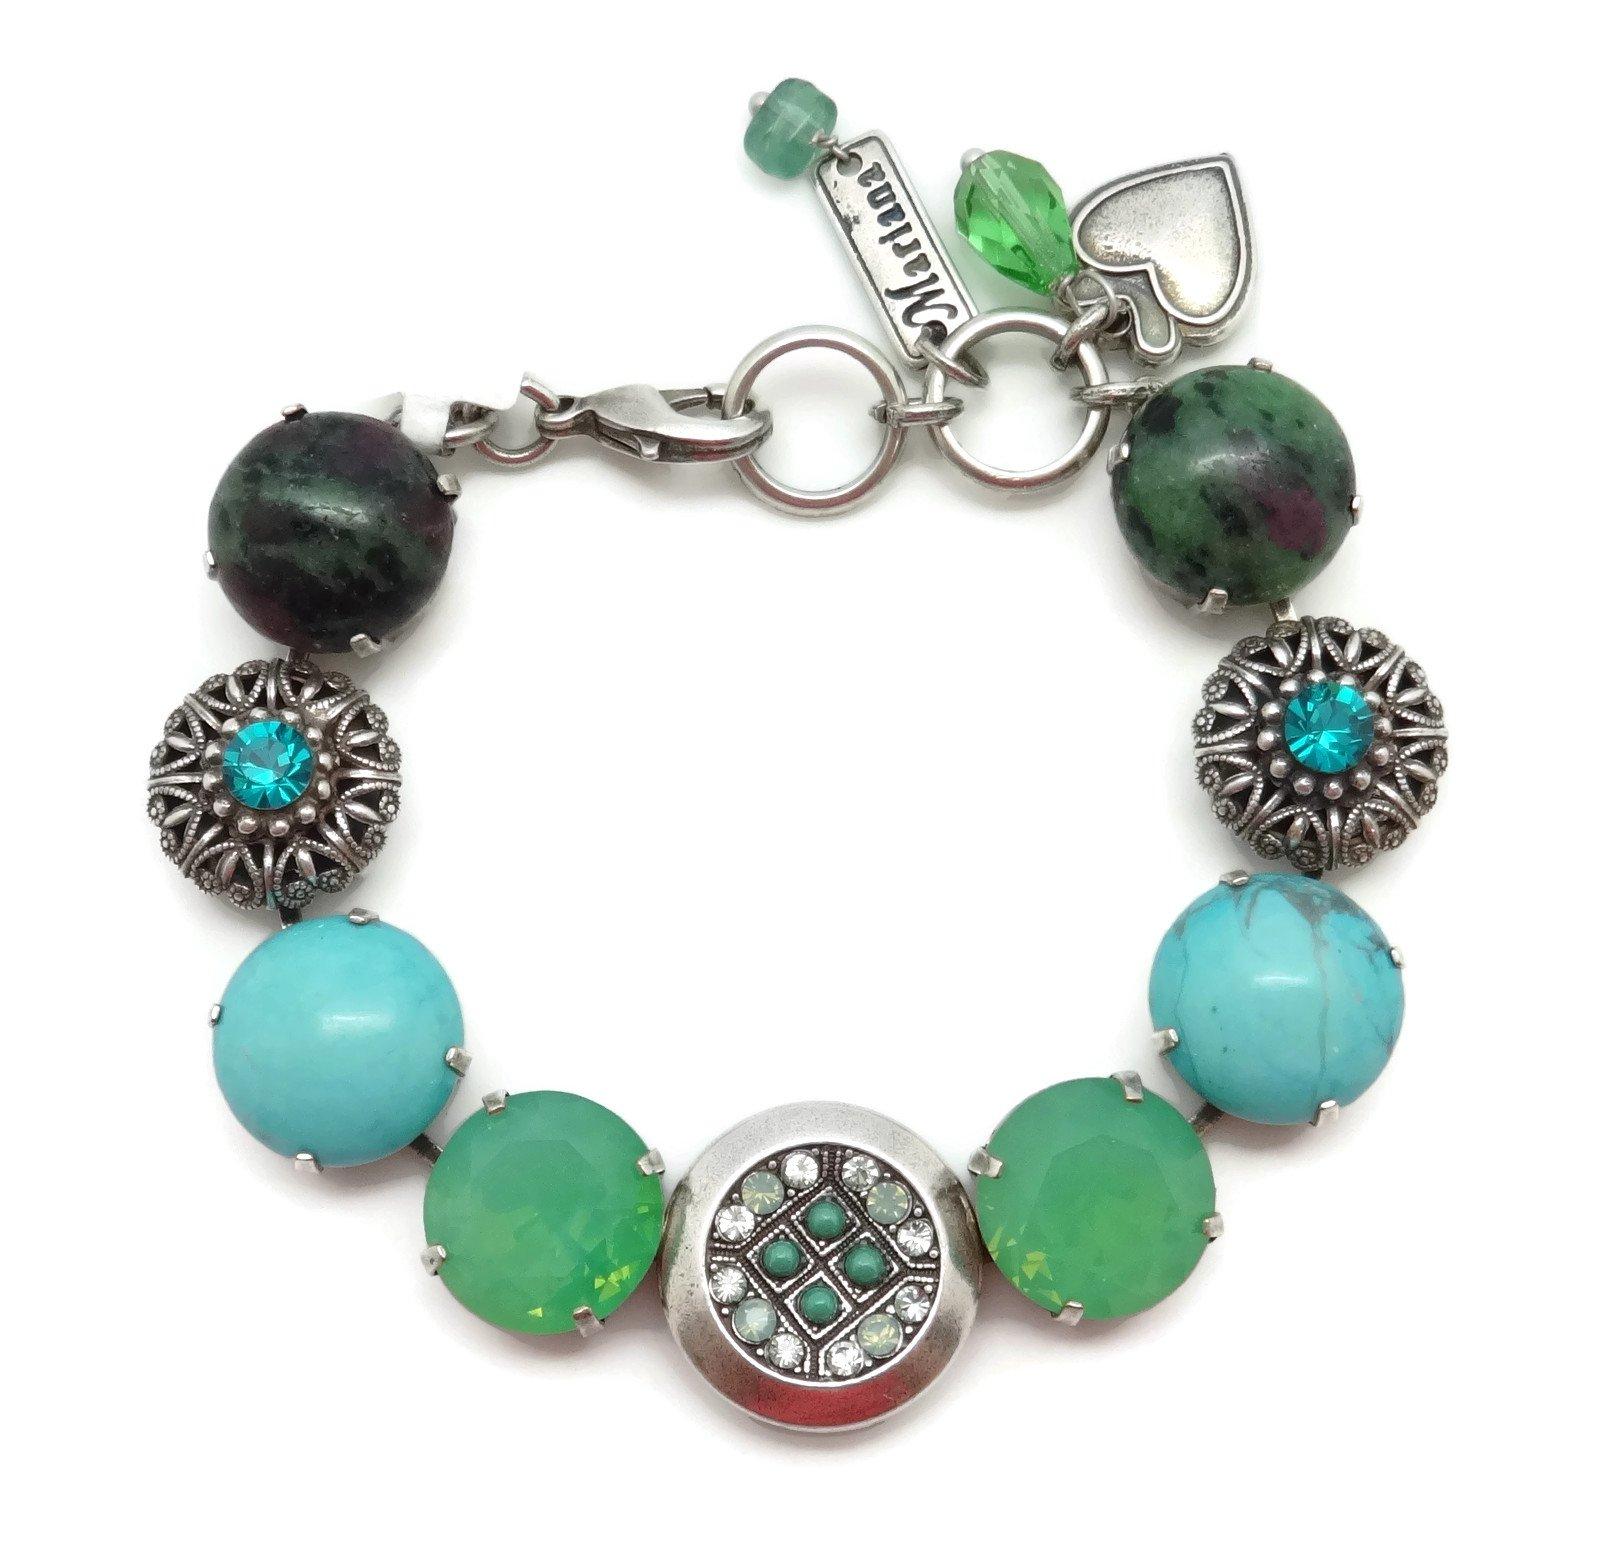 Mariana Silver Plated Swarovski Crystal & Mineral Stone Bracelet Green Mix M1076 Congo